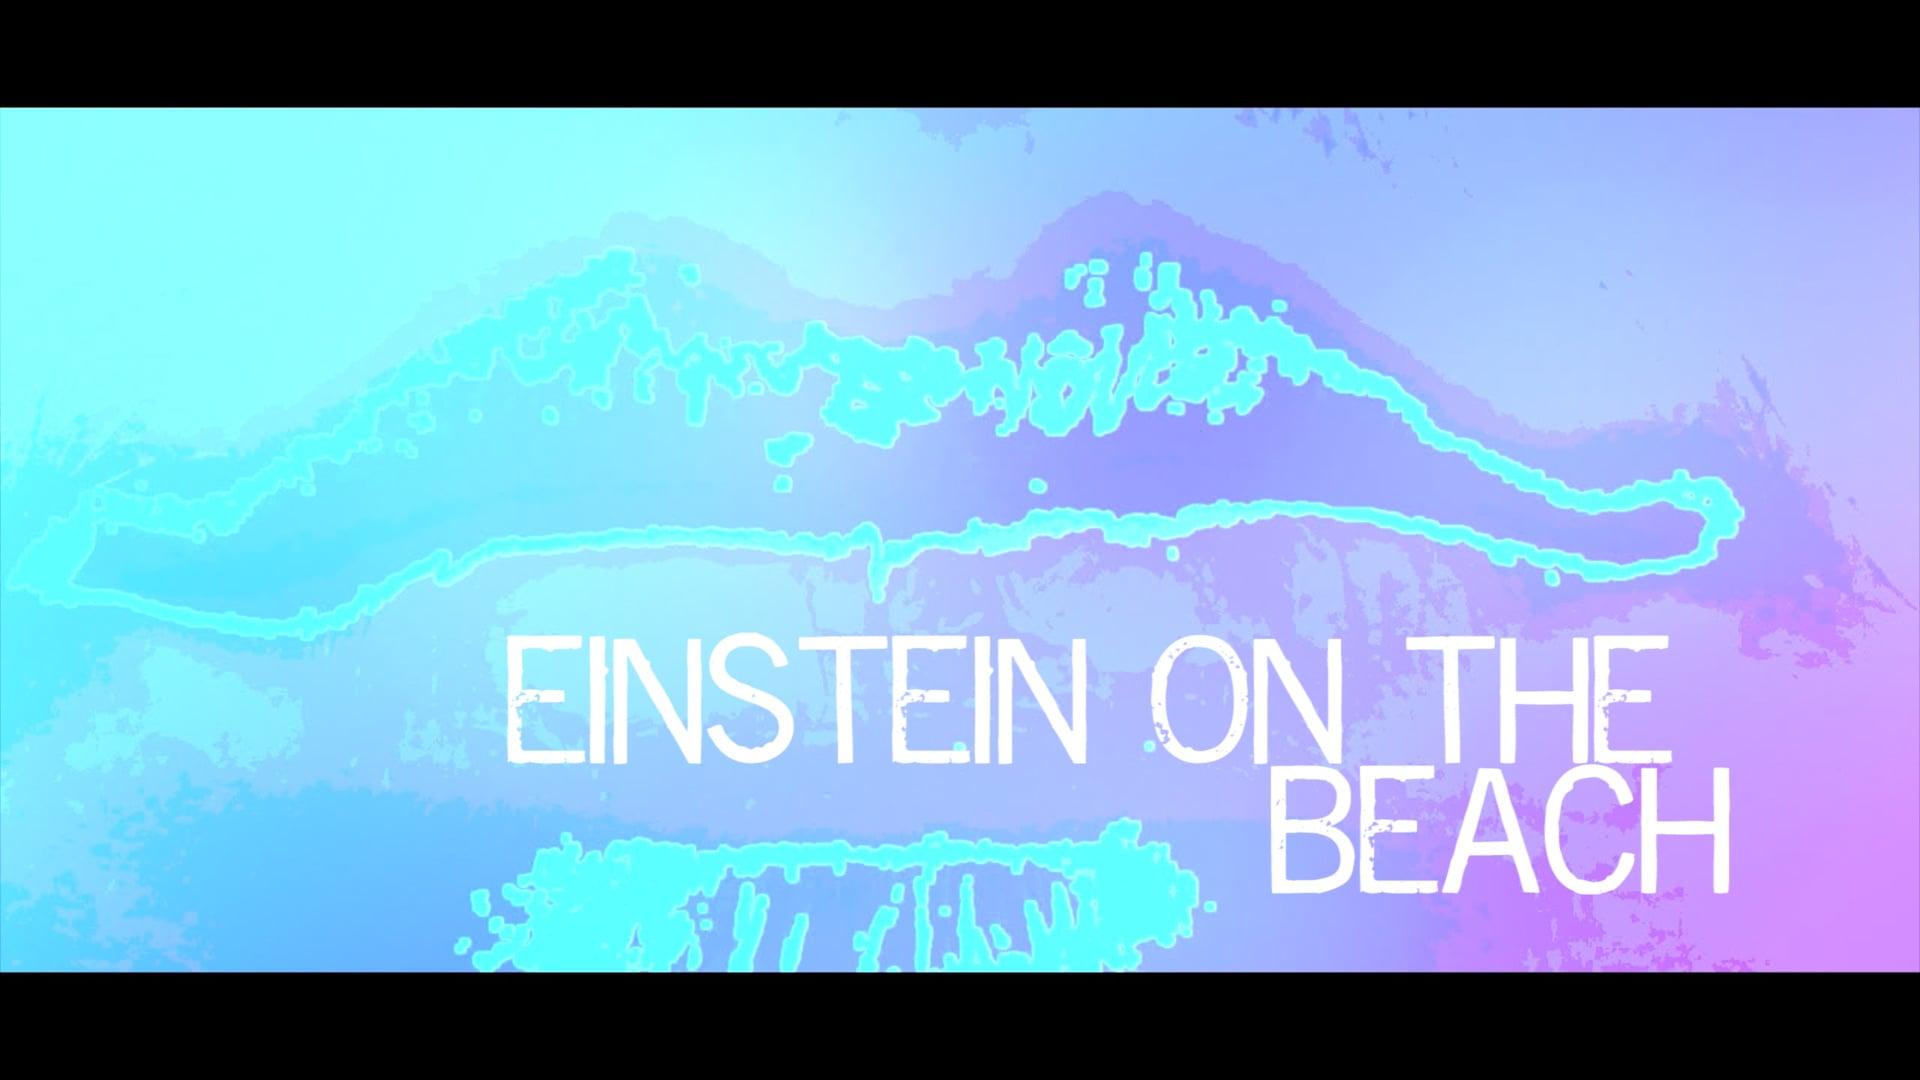 Einstein on the Beach: A Filmic Representation (Abstract Minimalist Short Film)